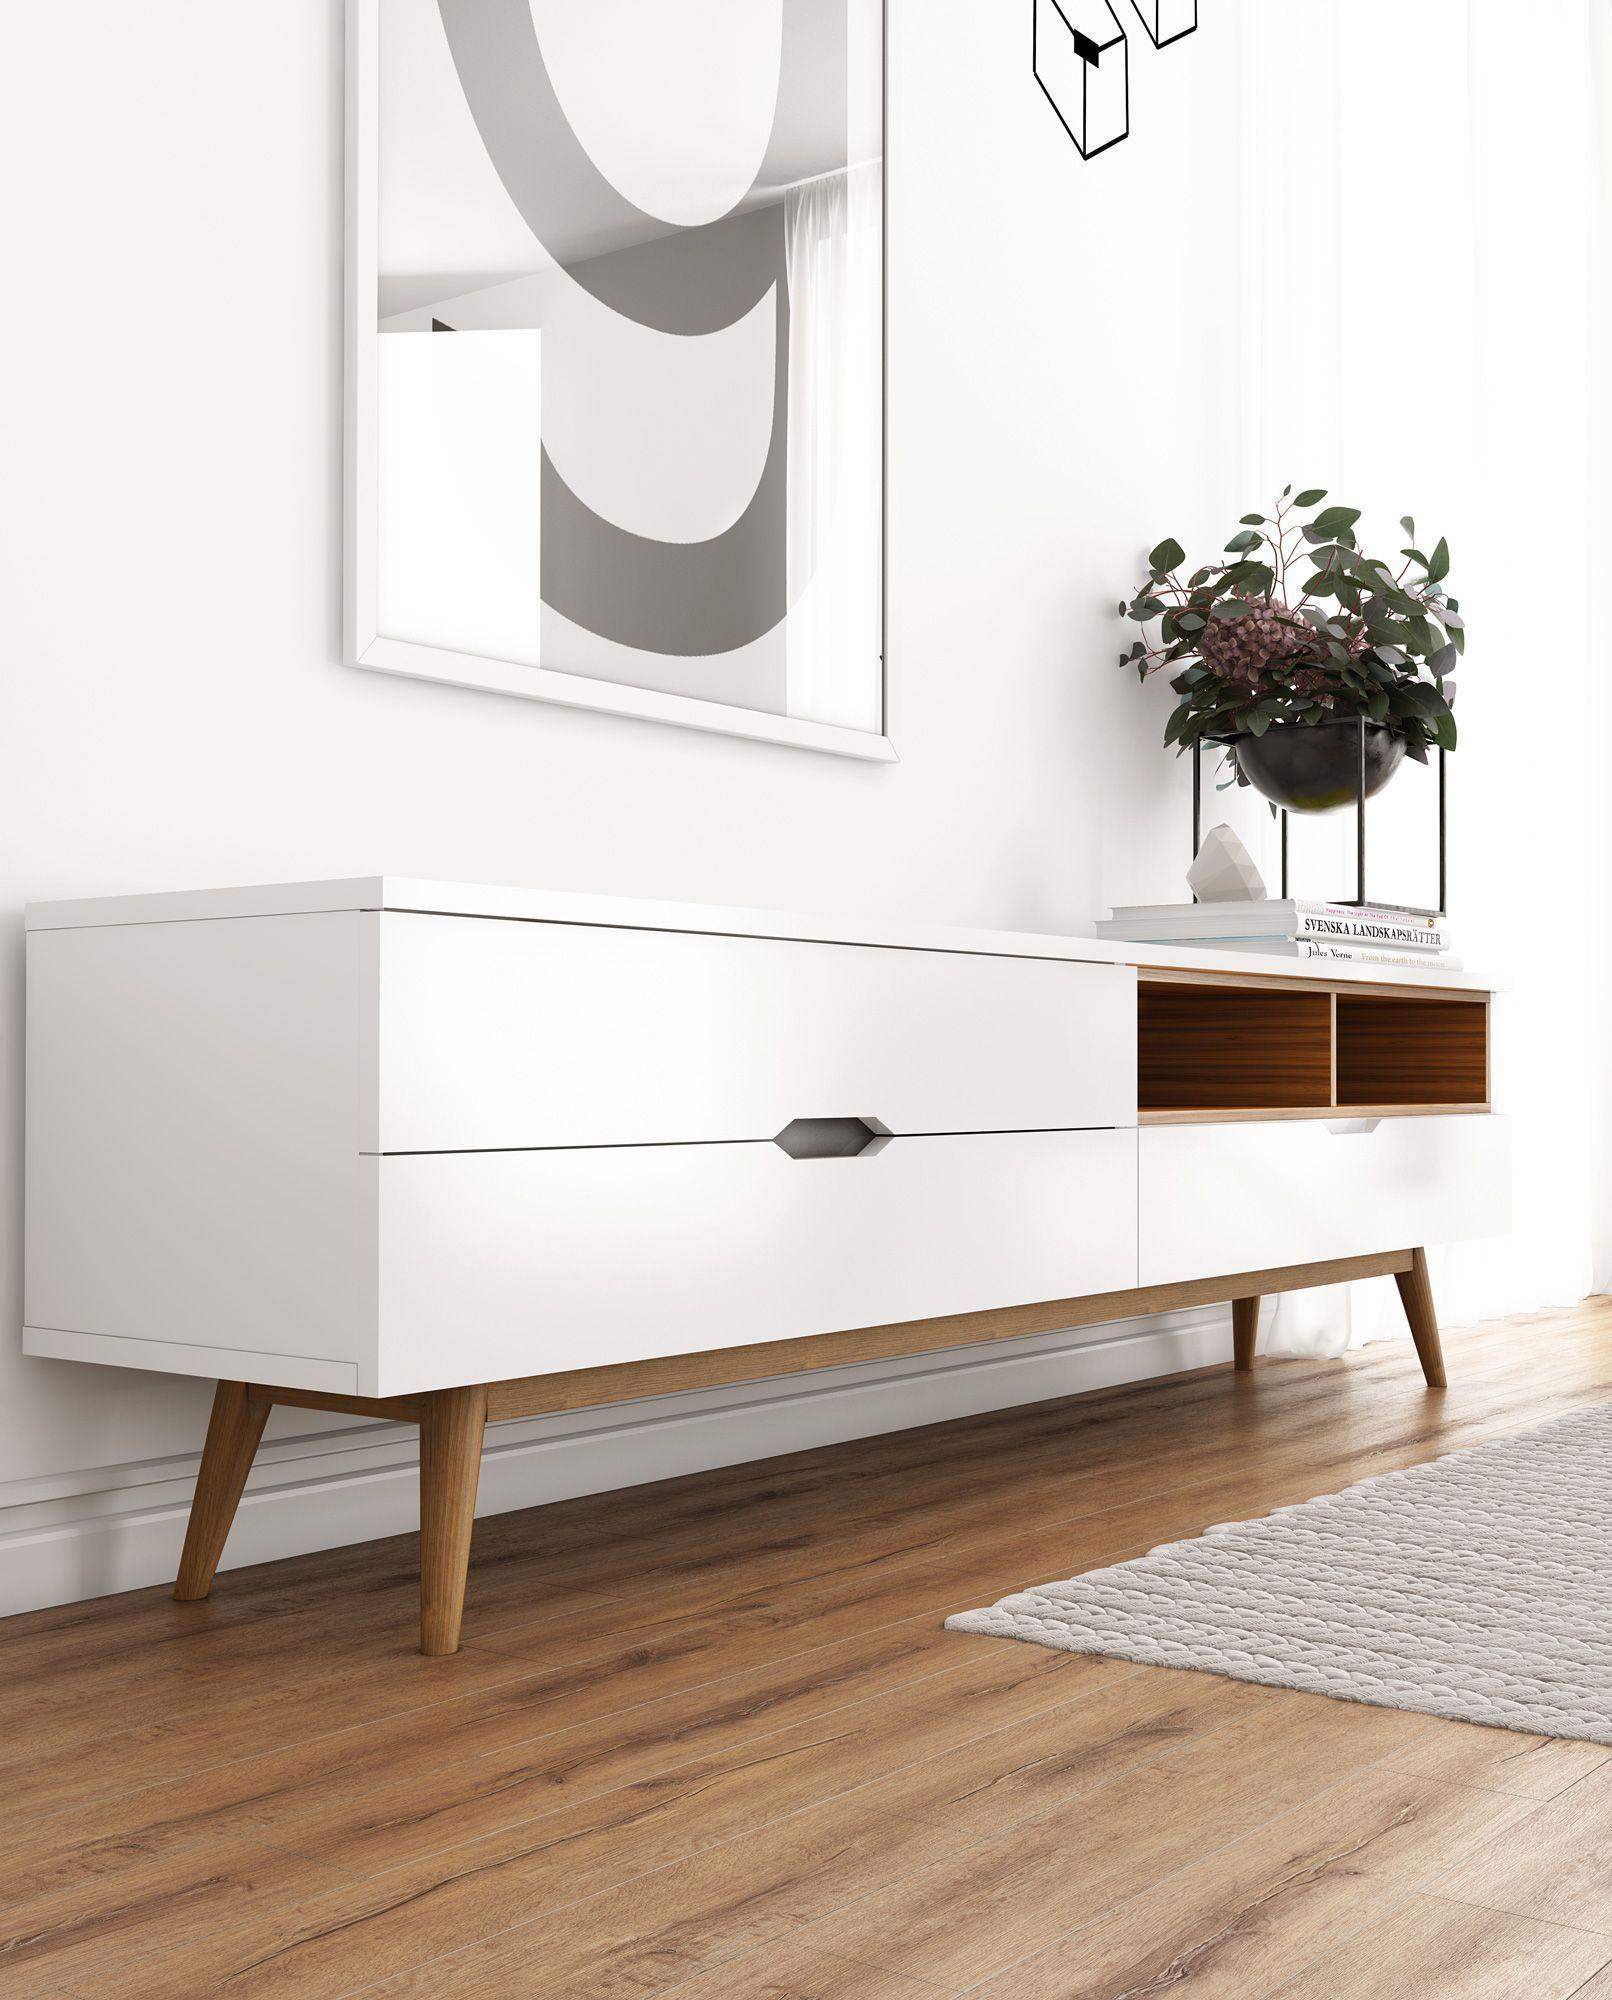 Best 15 Simple Modern Tv Stand Design Ideas For Your Home Tvstand Diytvstand Entertainme Living Room Decor Modern Tv Furniture Modern Scandinavian Interior